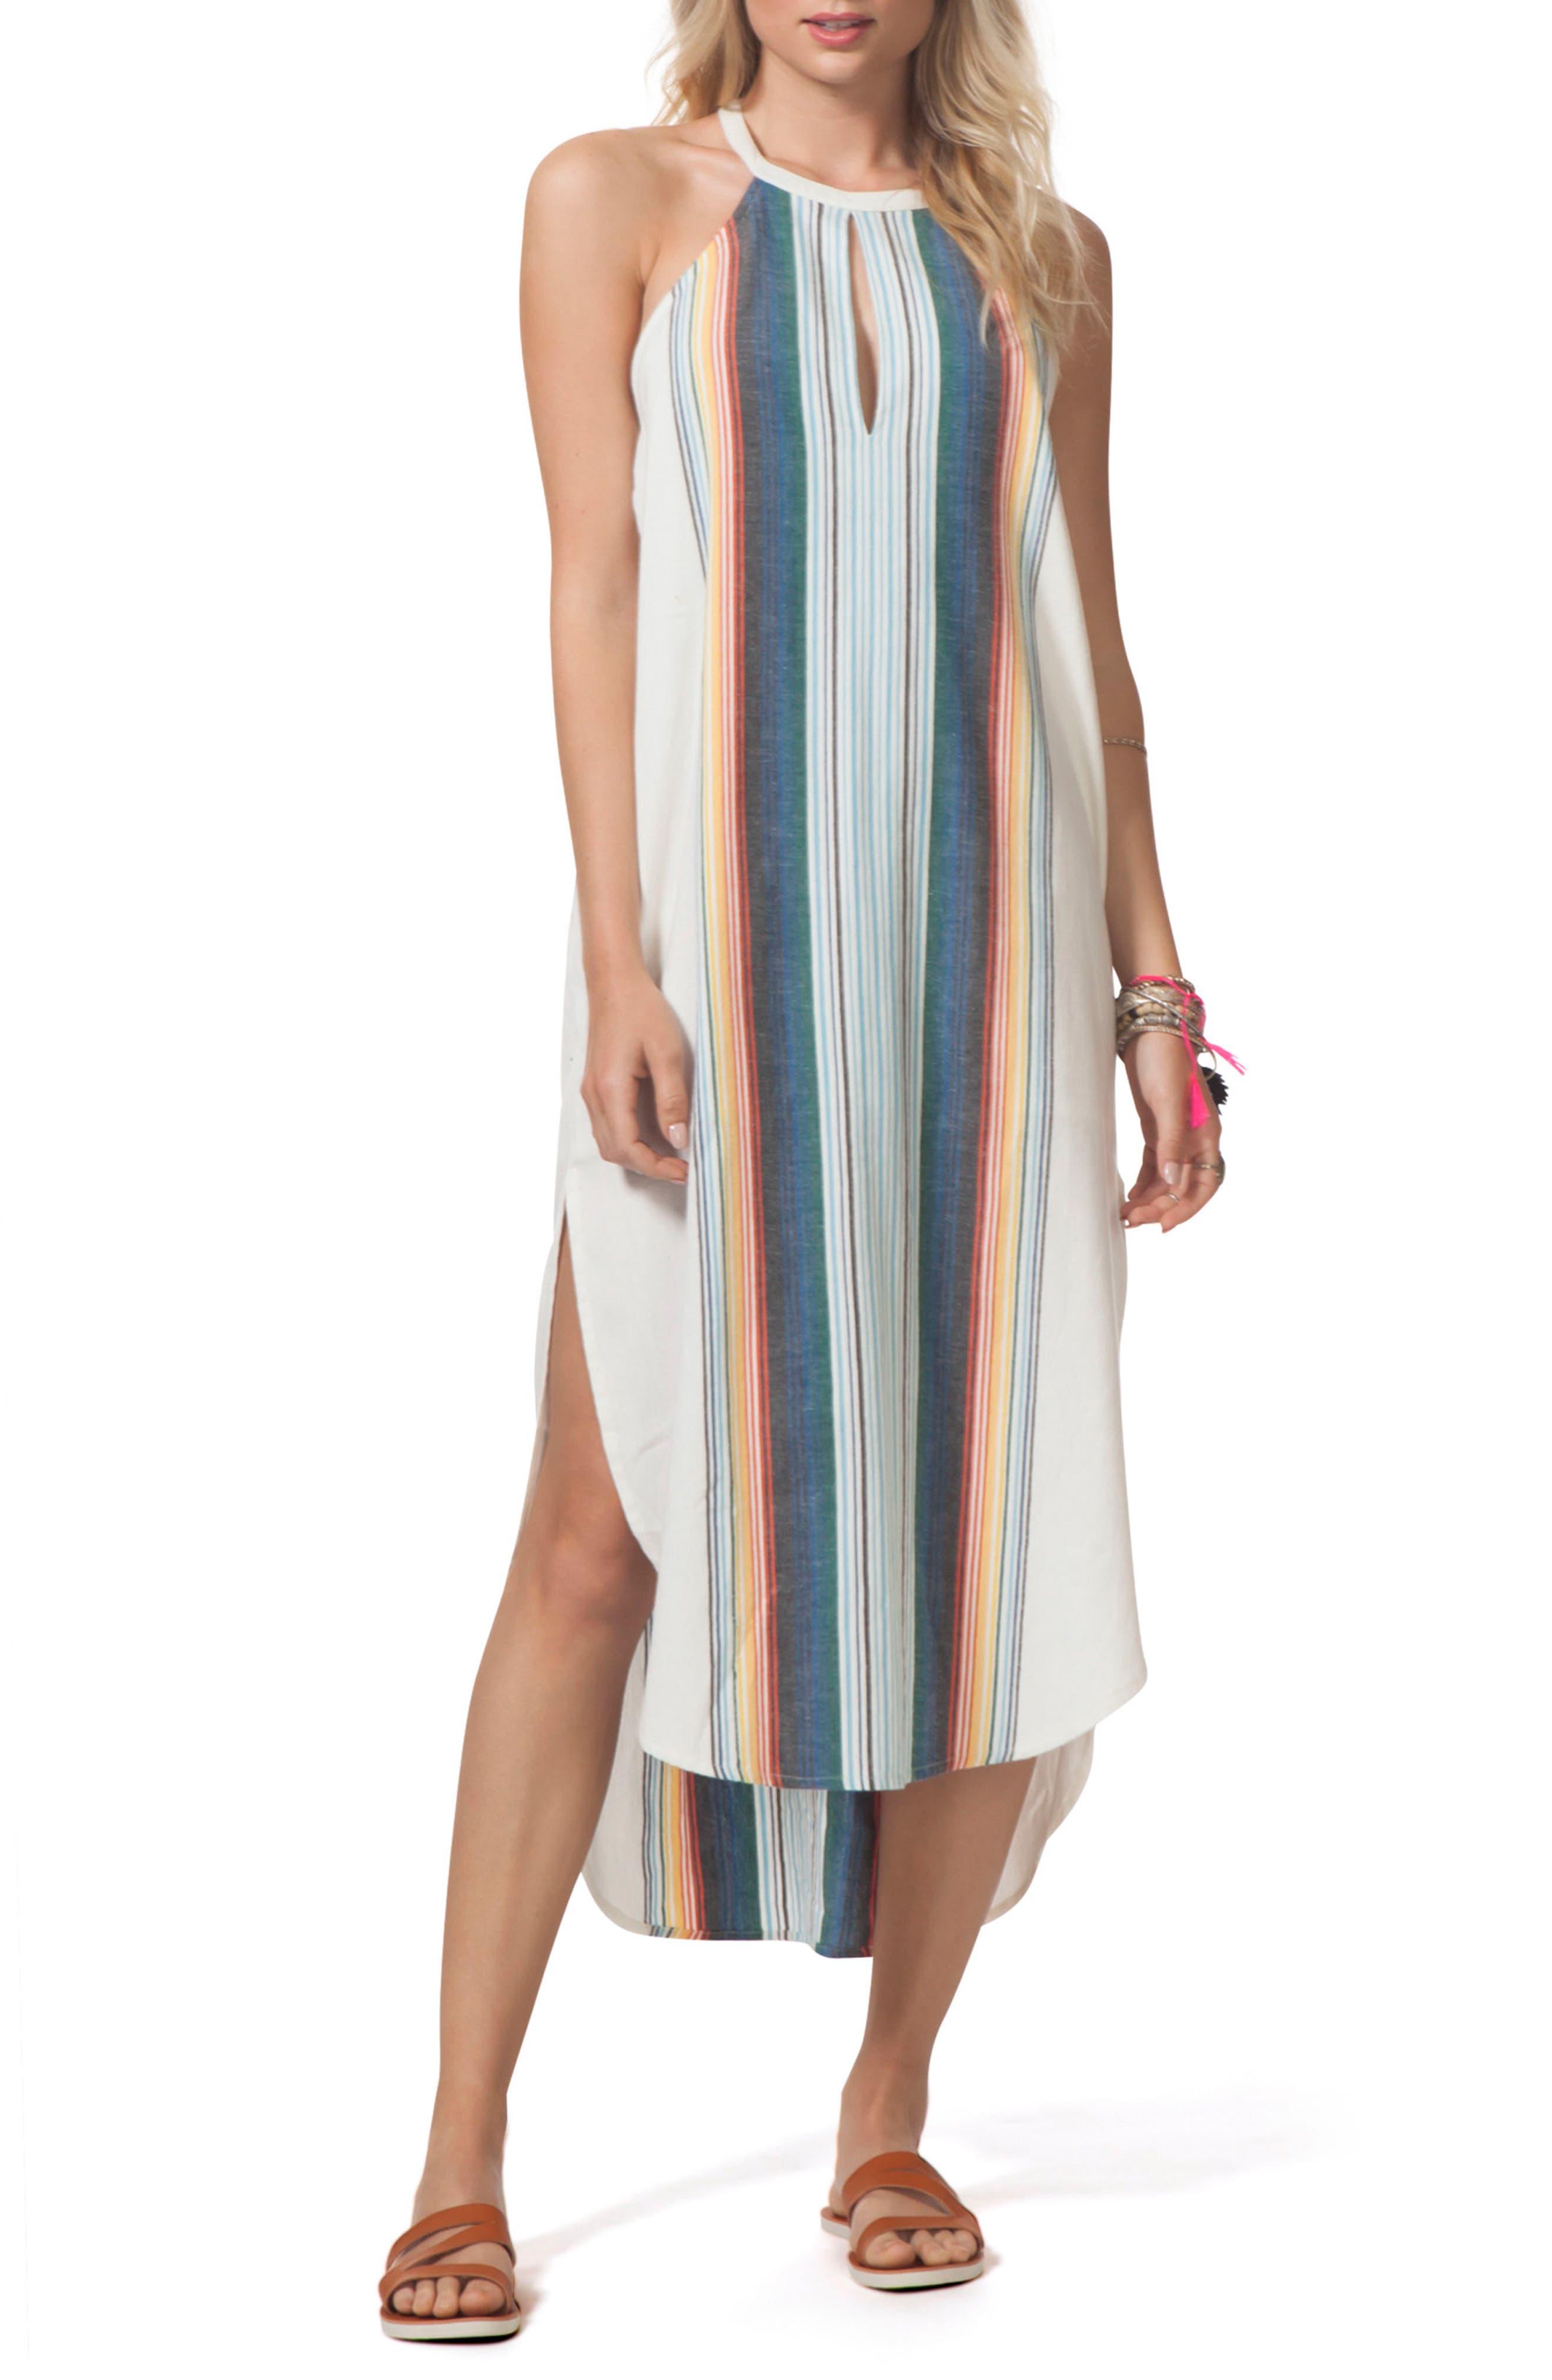 Beach Bazaar Maxi Dress,                         Main,                         color, 111